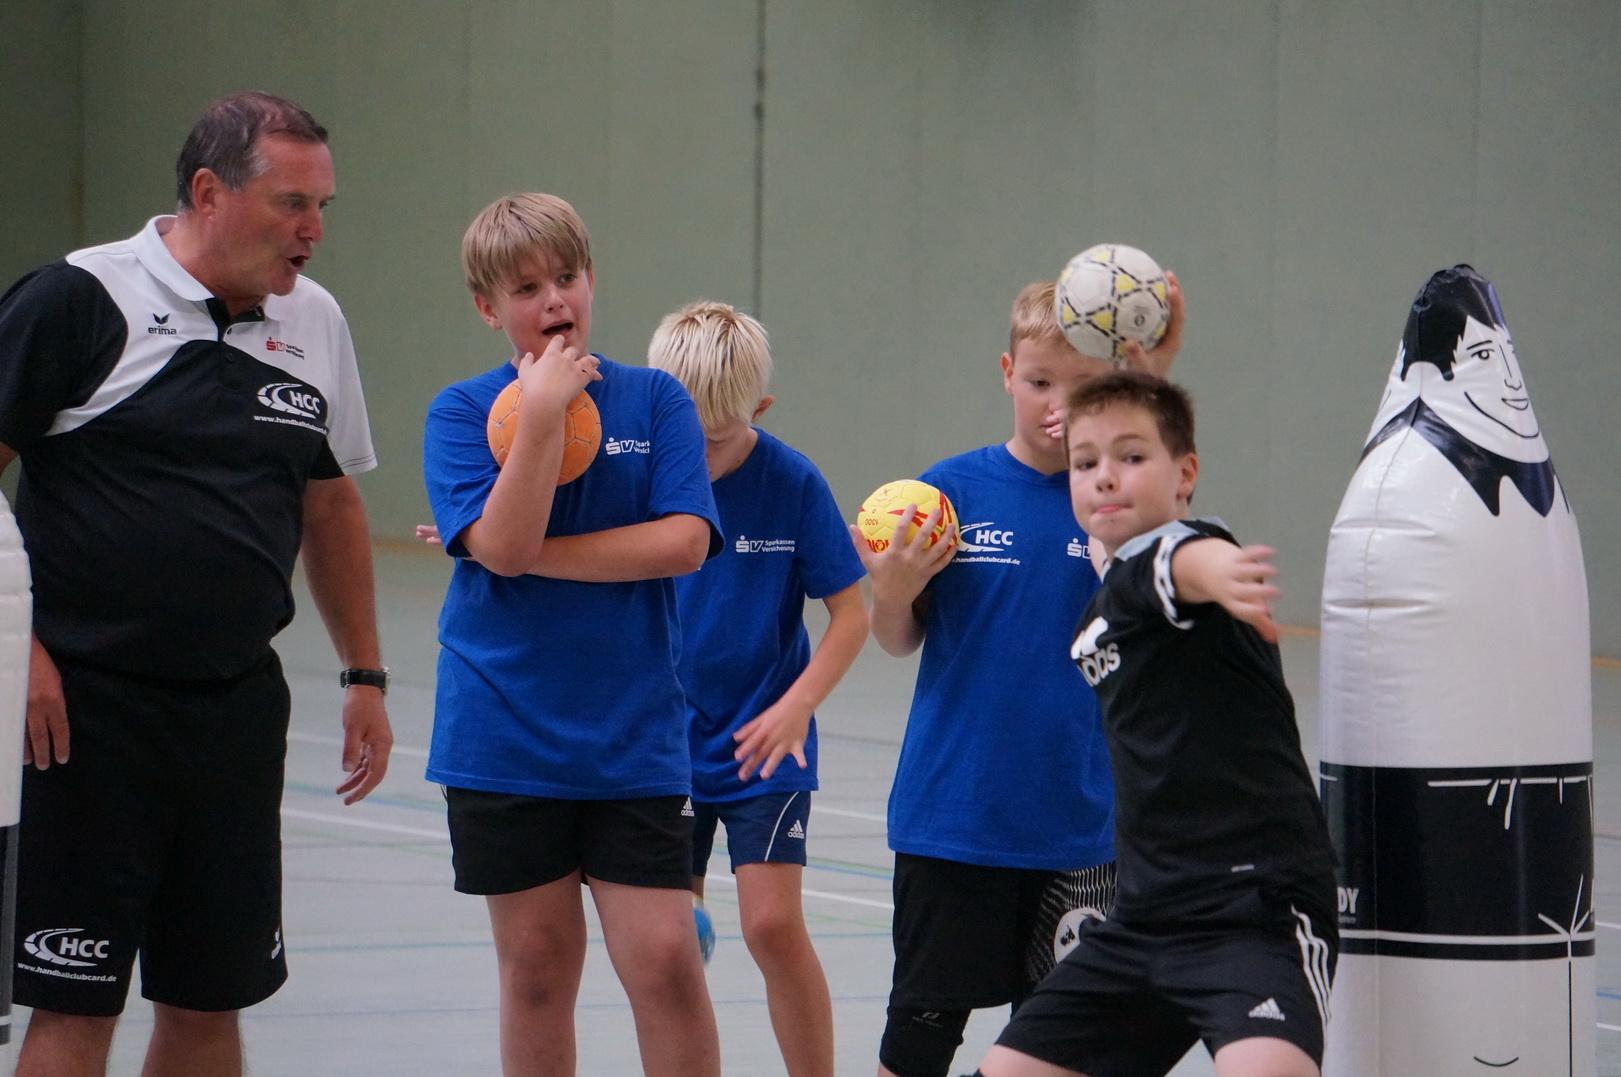 201808_Handballcamp_SDH_MG_231w